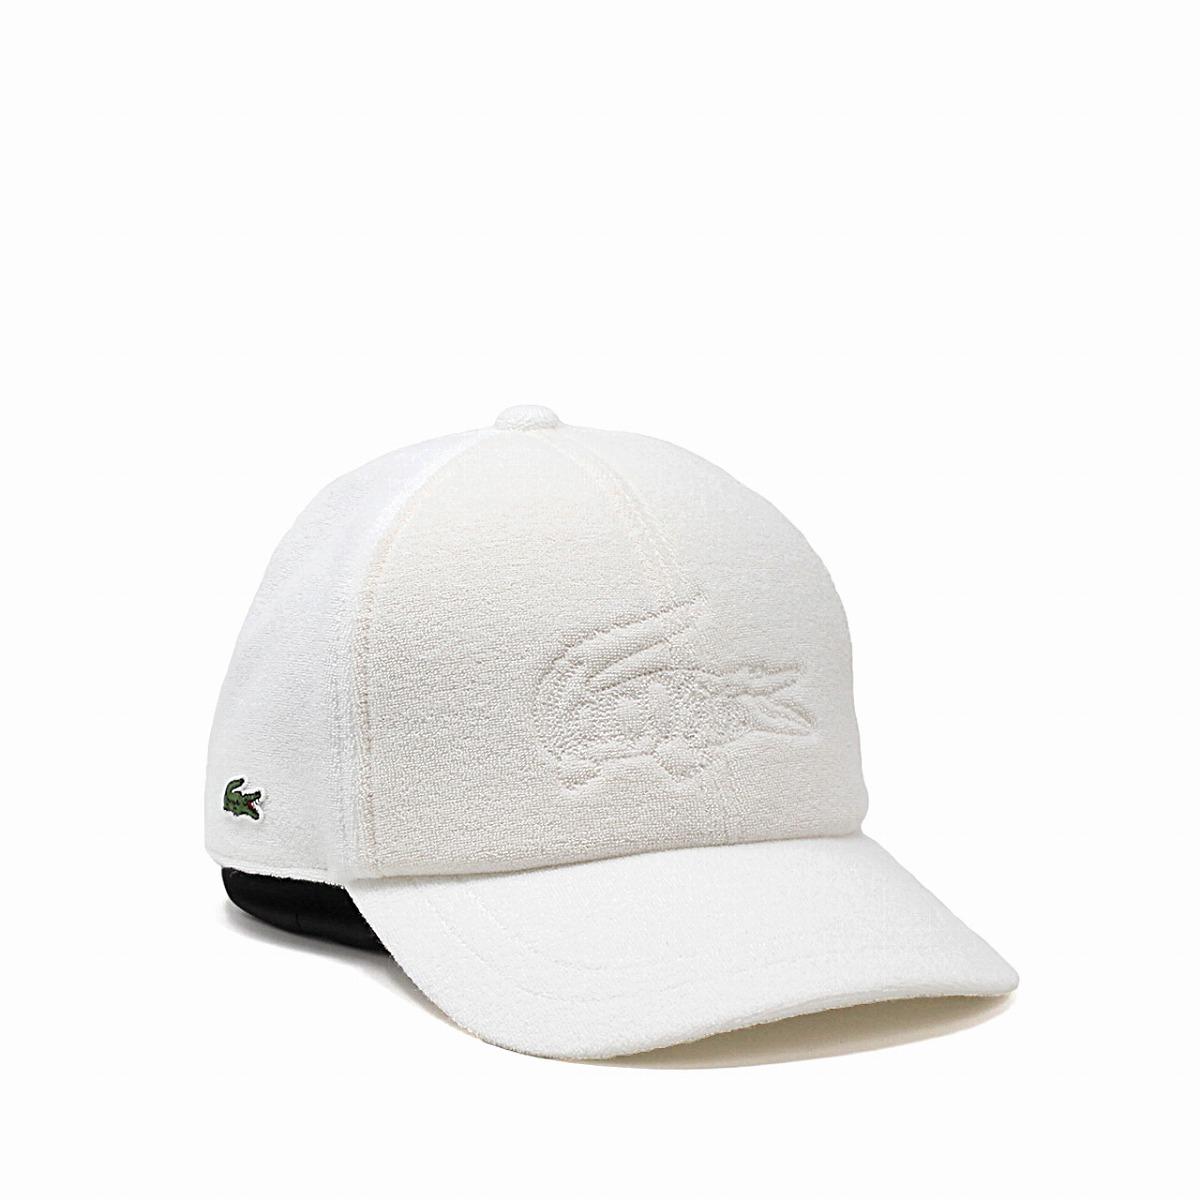 a59cb9925 Men gap Dis CAP Lacoste hat crocodile embroidery pile 58cm simple plain  sports   white off-white  cap  made in cap pile cloth LACOSTE cotton Japan  in the ...